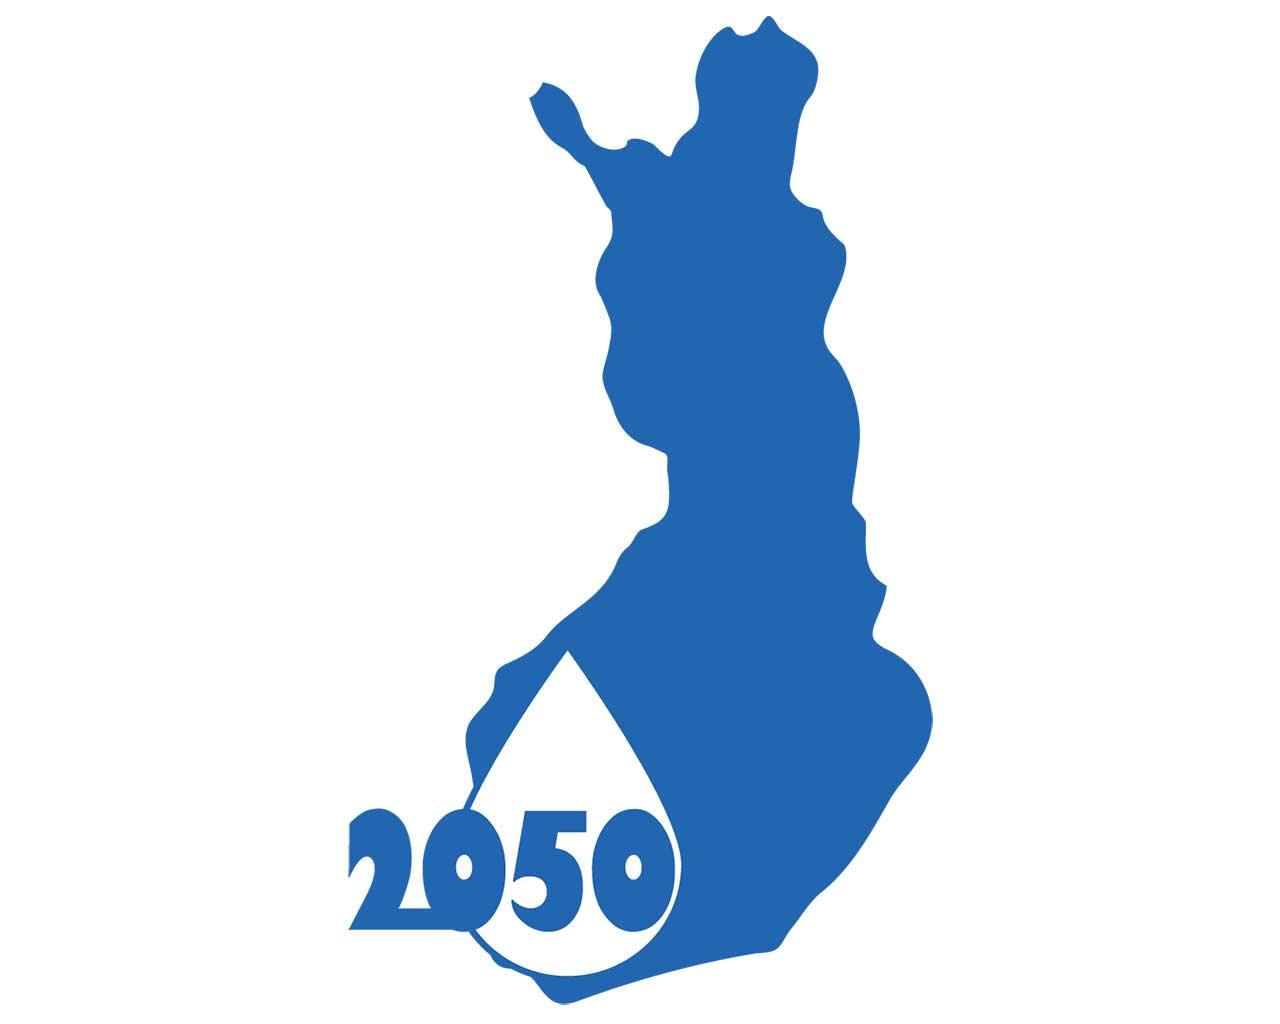 Suomen kartta, pisara ja vuosi 2050